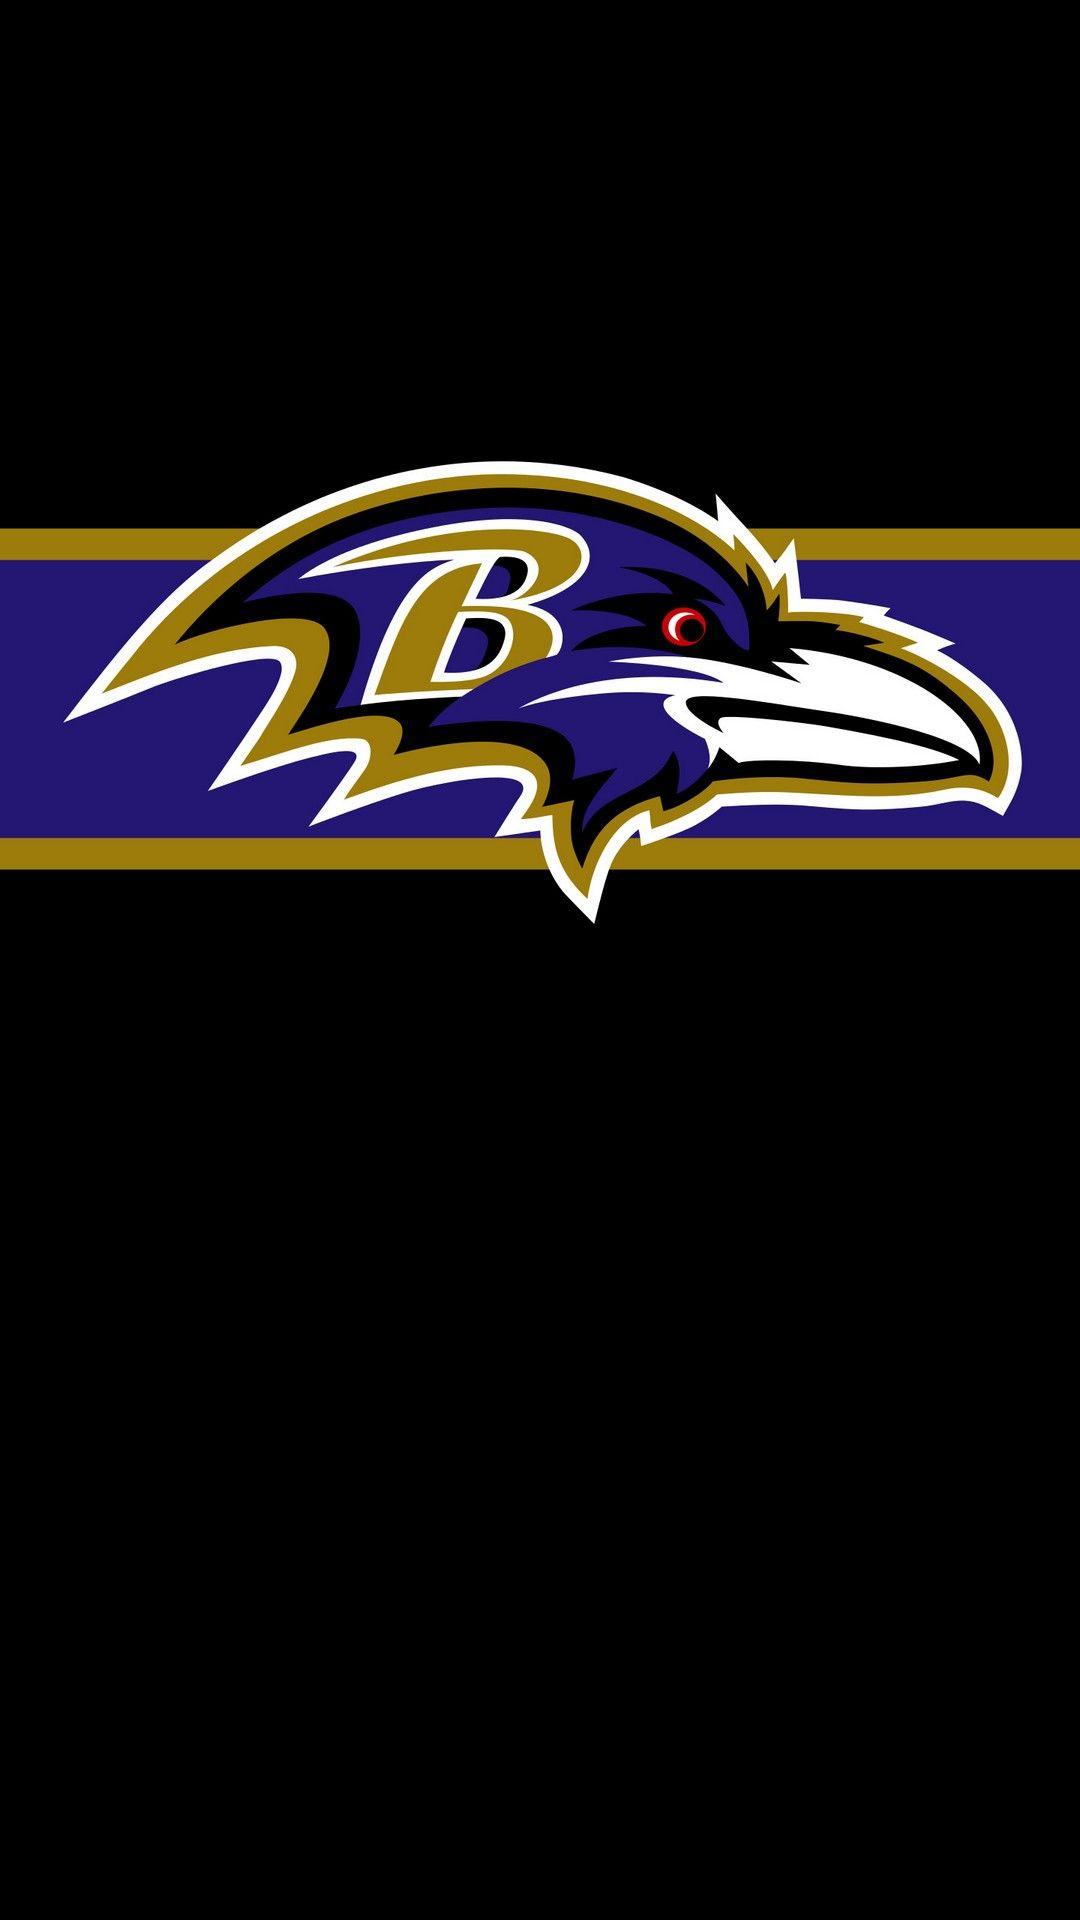 Nfl Wallpapers In 2020 Baltimore Ravens Logo Nfl Football Wallpaper Baltimore Ravens Wallpapers